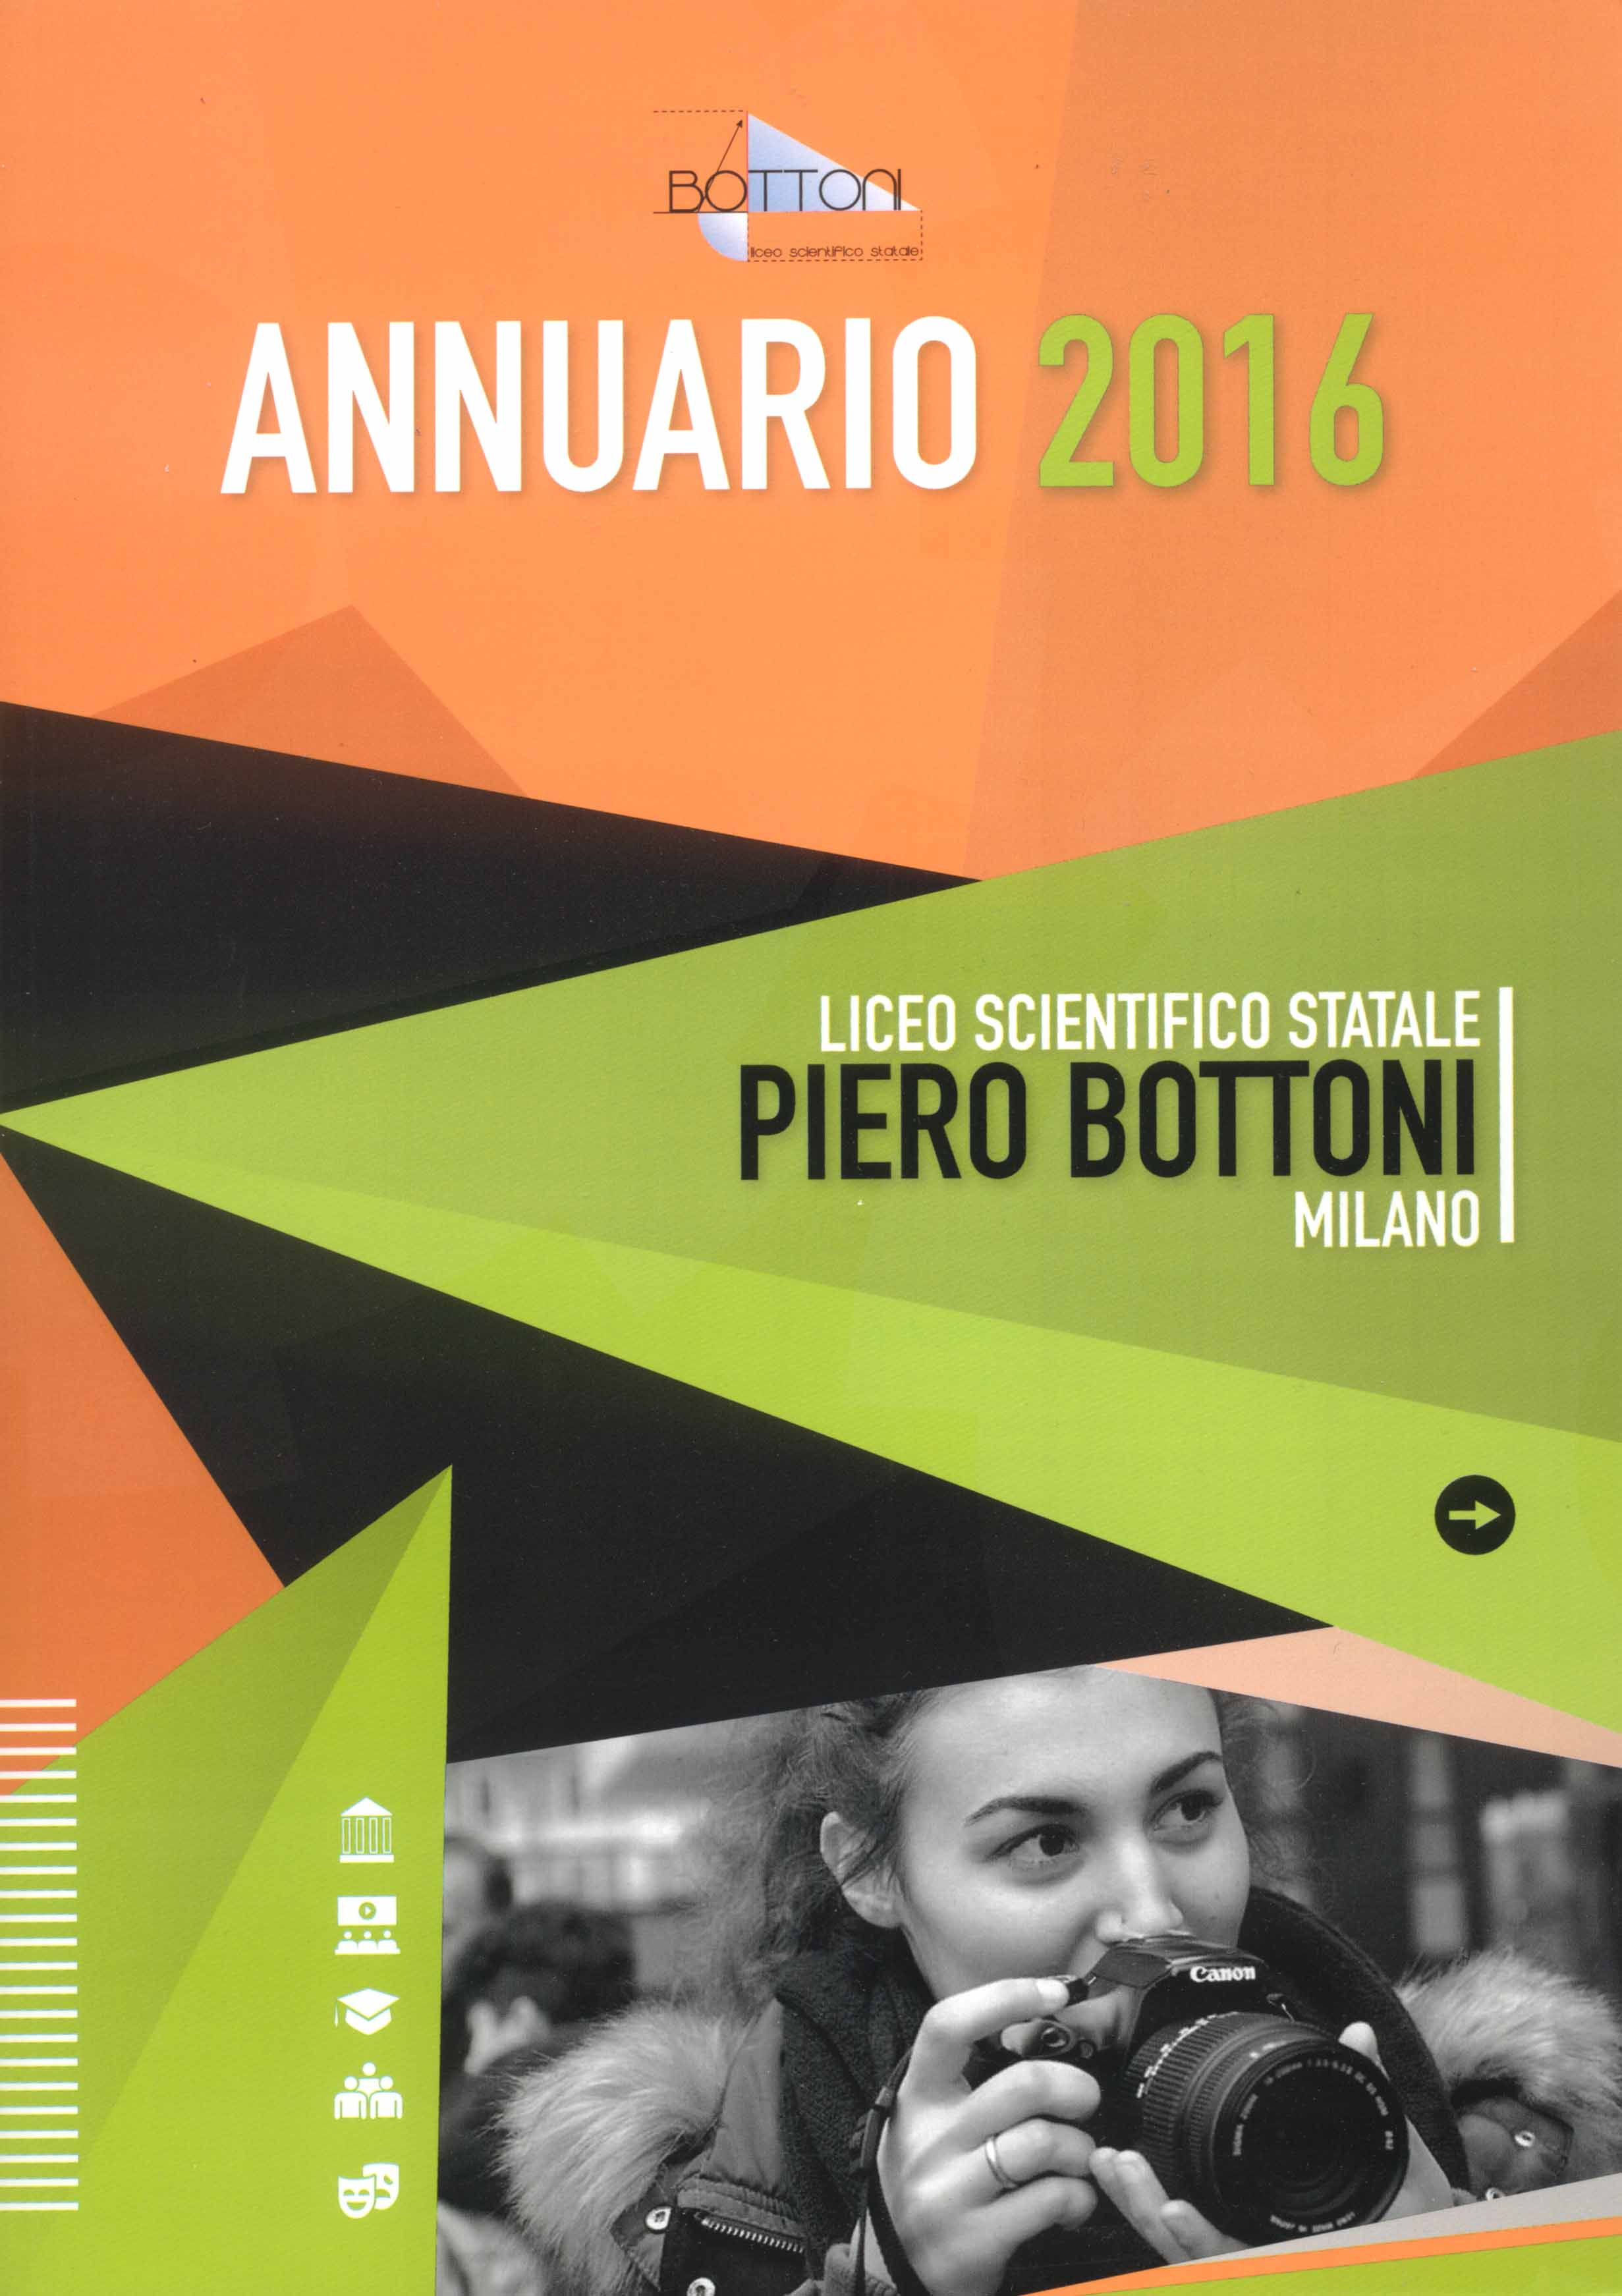 Cover annuario 2016 annuario 2016